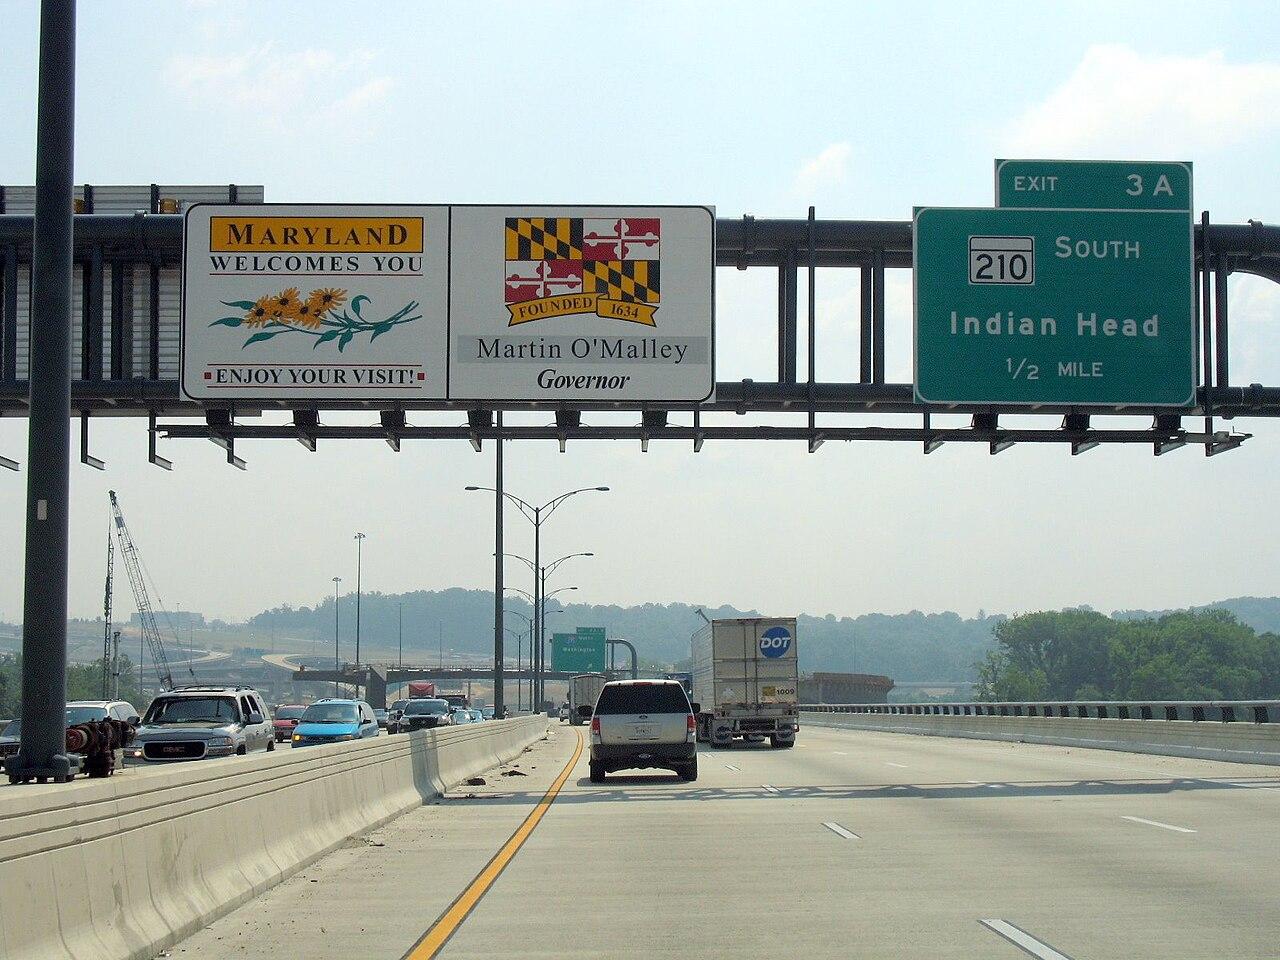 Bus Ocean City Md To Washington Dc